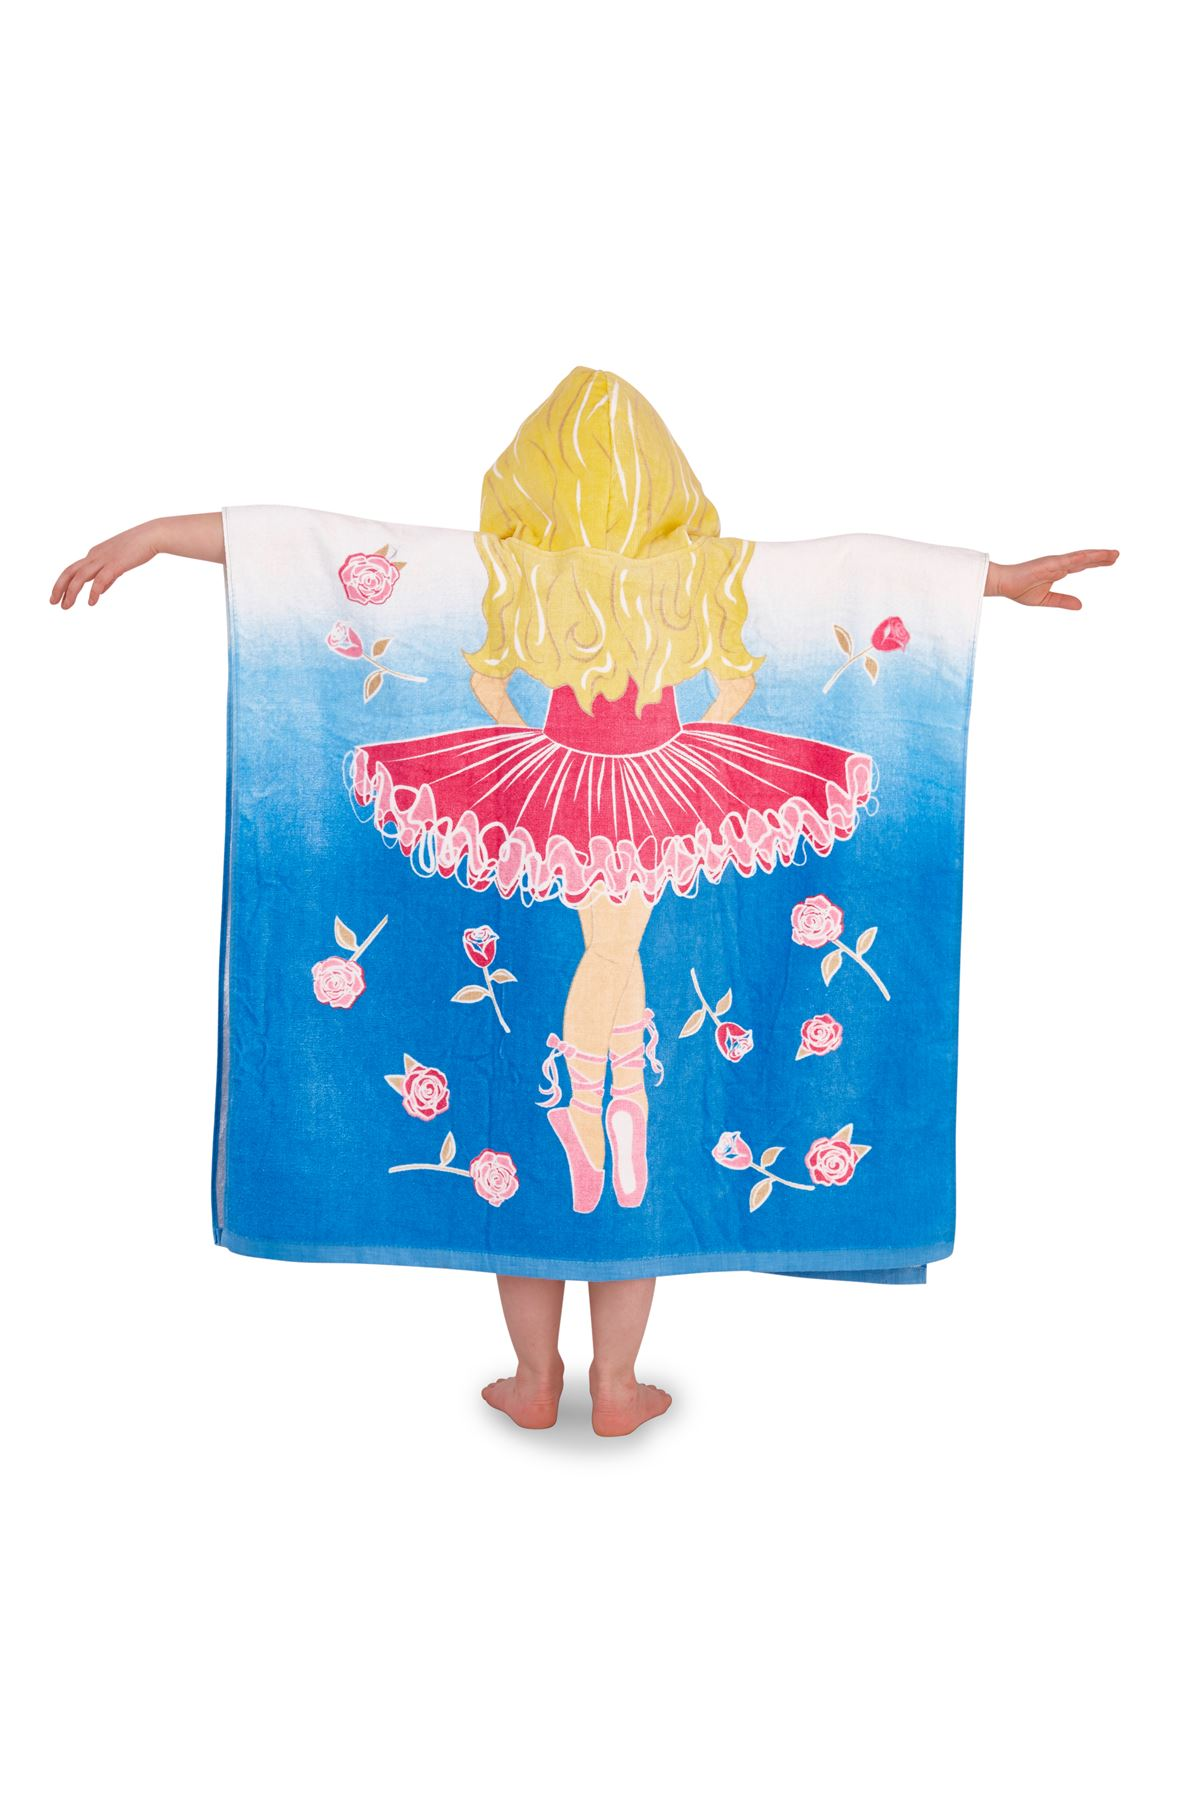 Childrens-Kids-Boys-Girls-Novelty-Hooded-Poncho-Swimming-Swim-Bath-Beach-Towel thumbnail 3